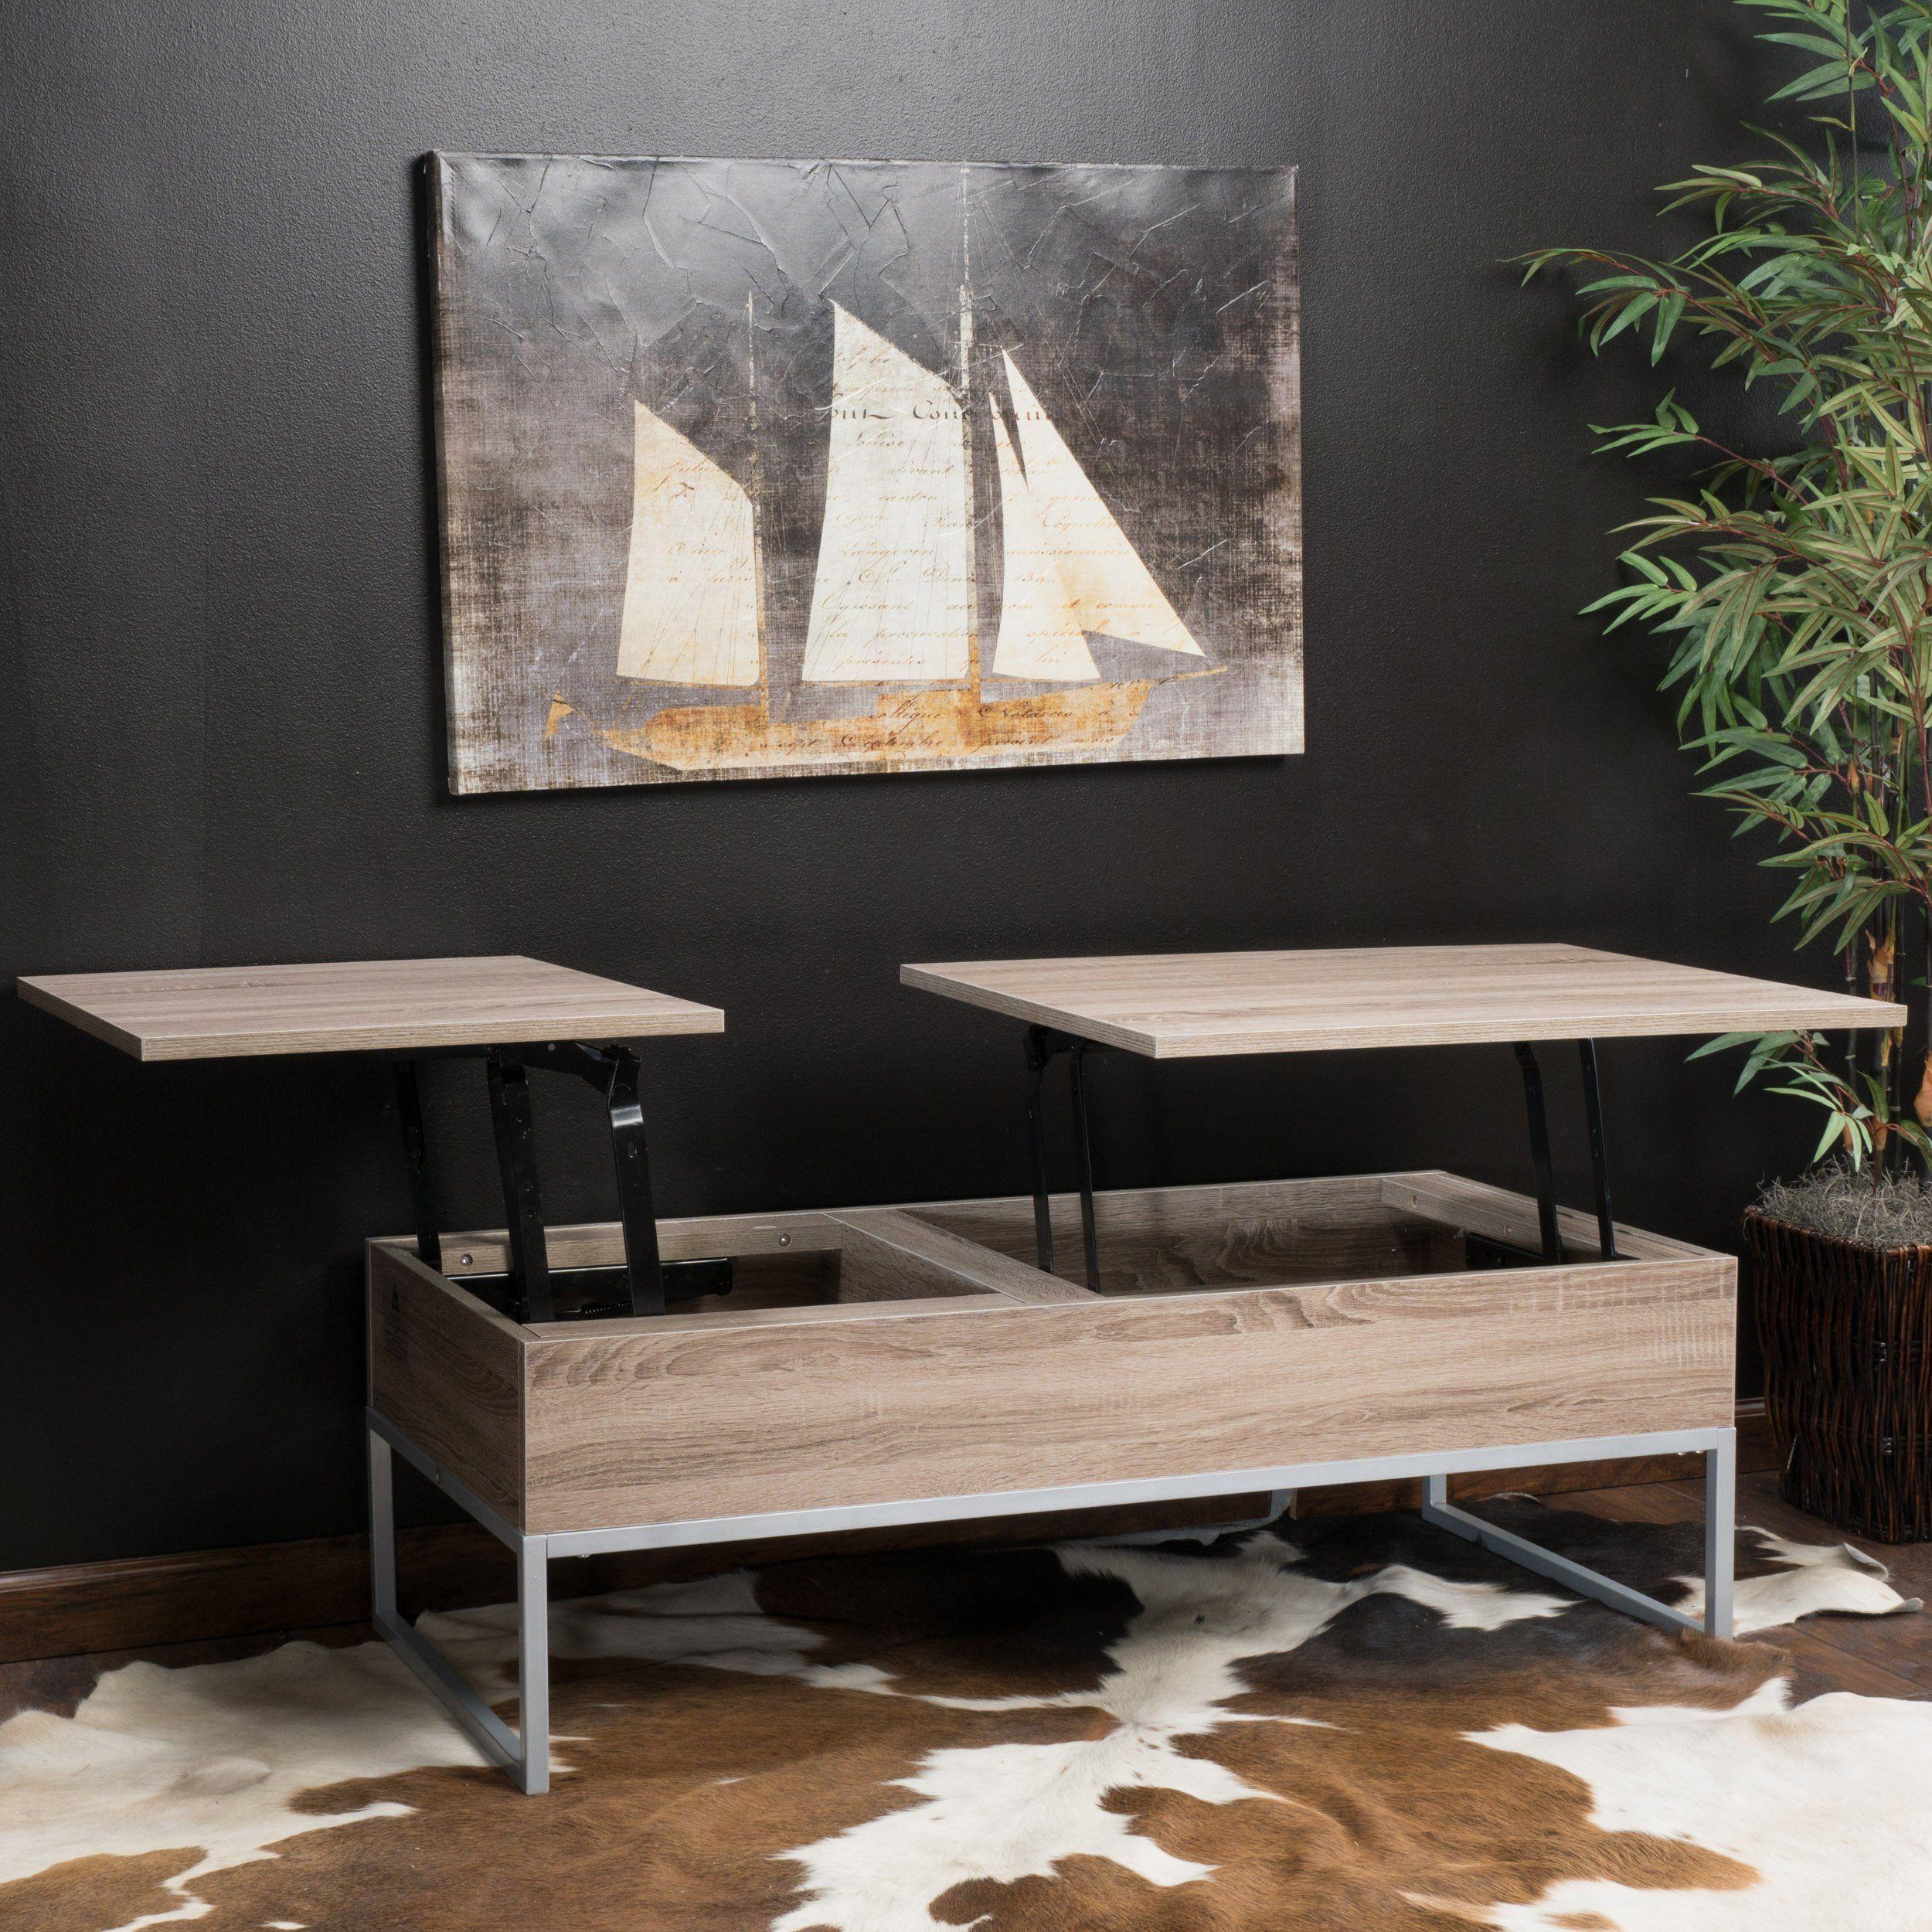 Cerise Rectangle Lift Top Storage Coffee Table In 2021 Coffee Table Coffee Table Wood Coffee Table With Storage [ 2500 x 2500 Pixel ]